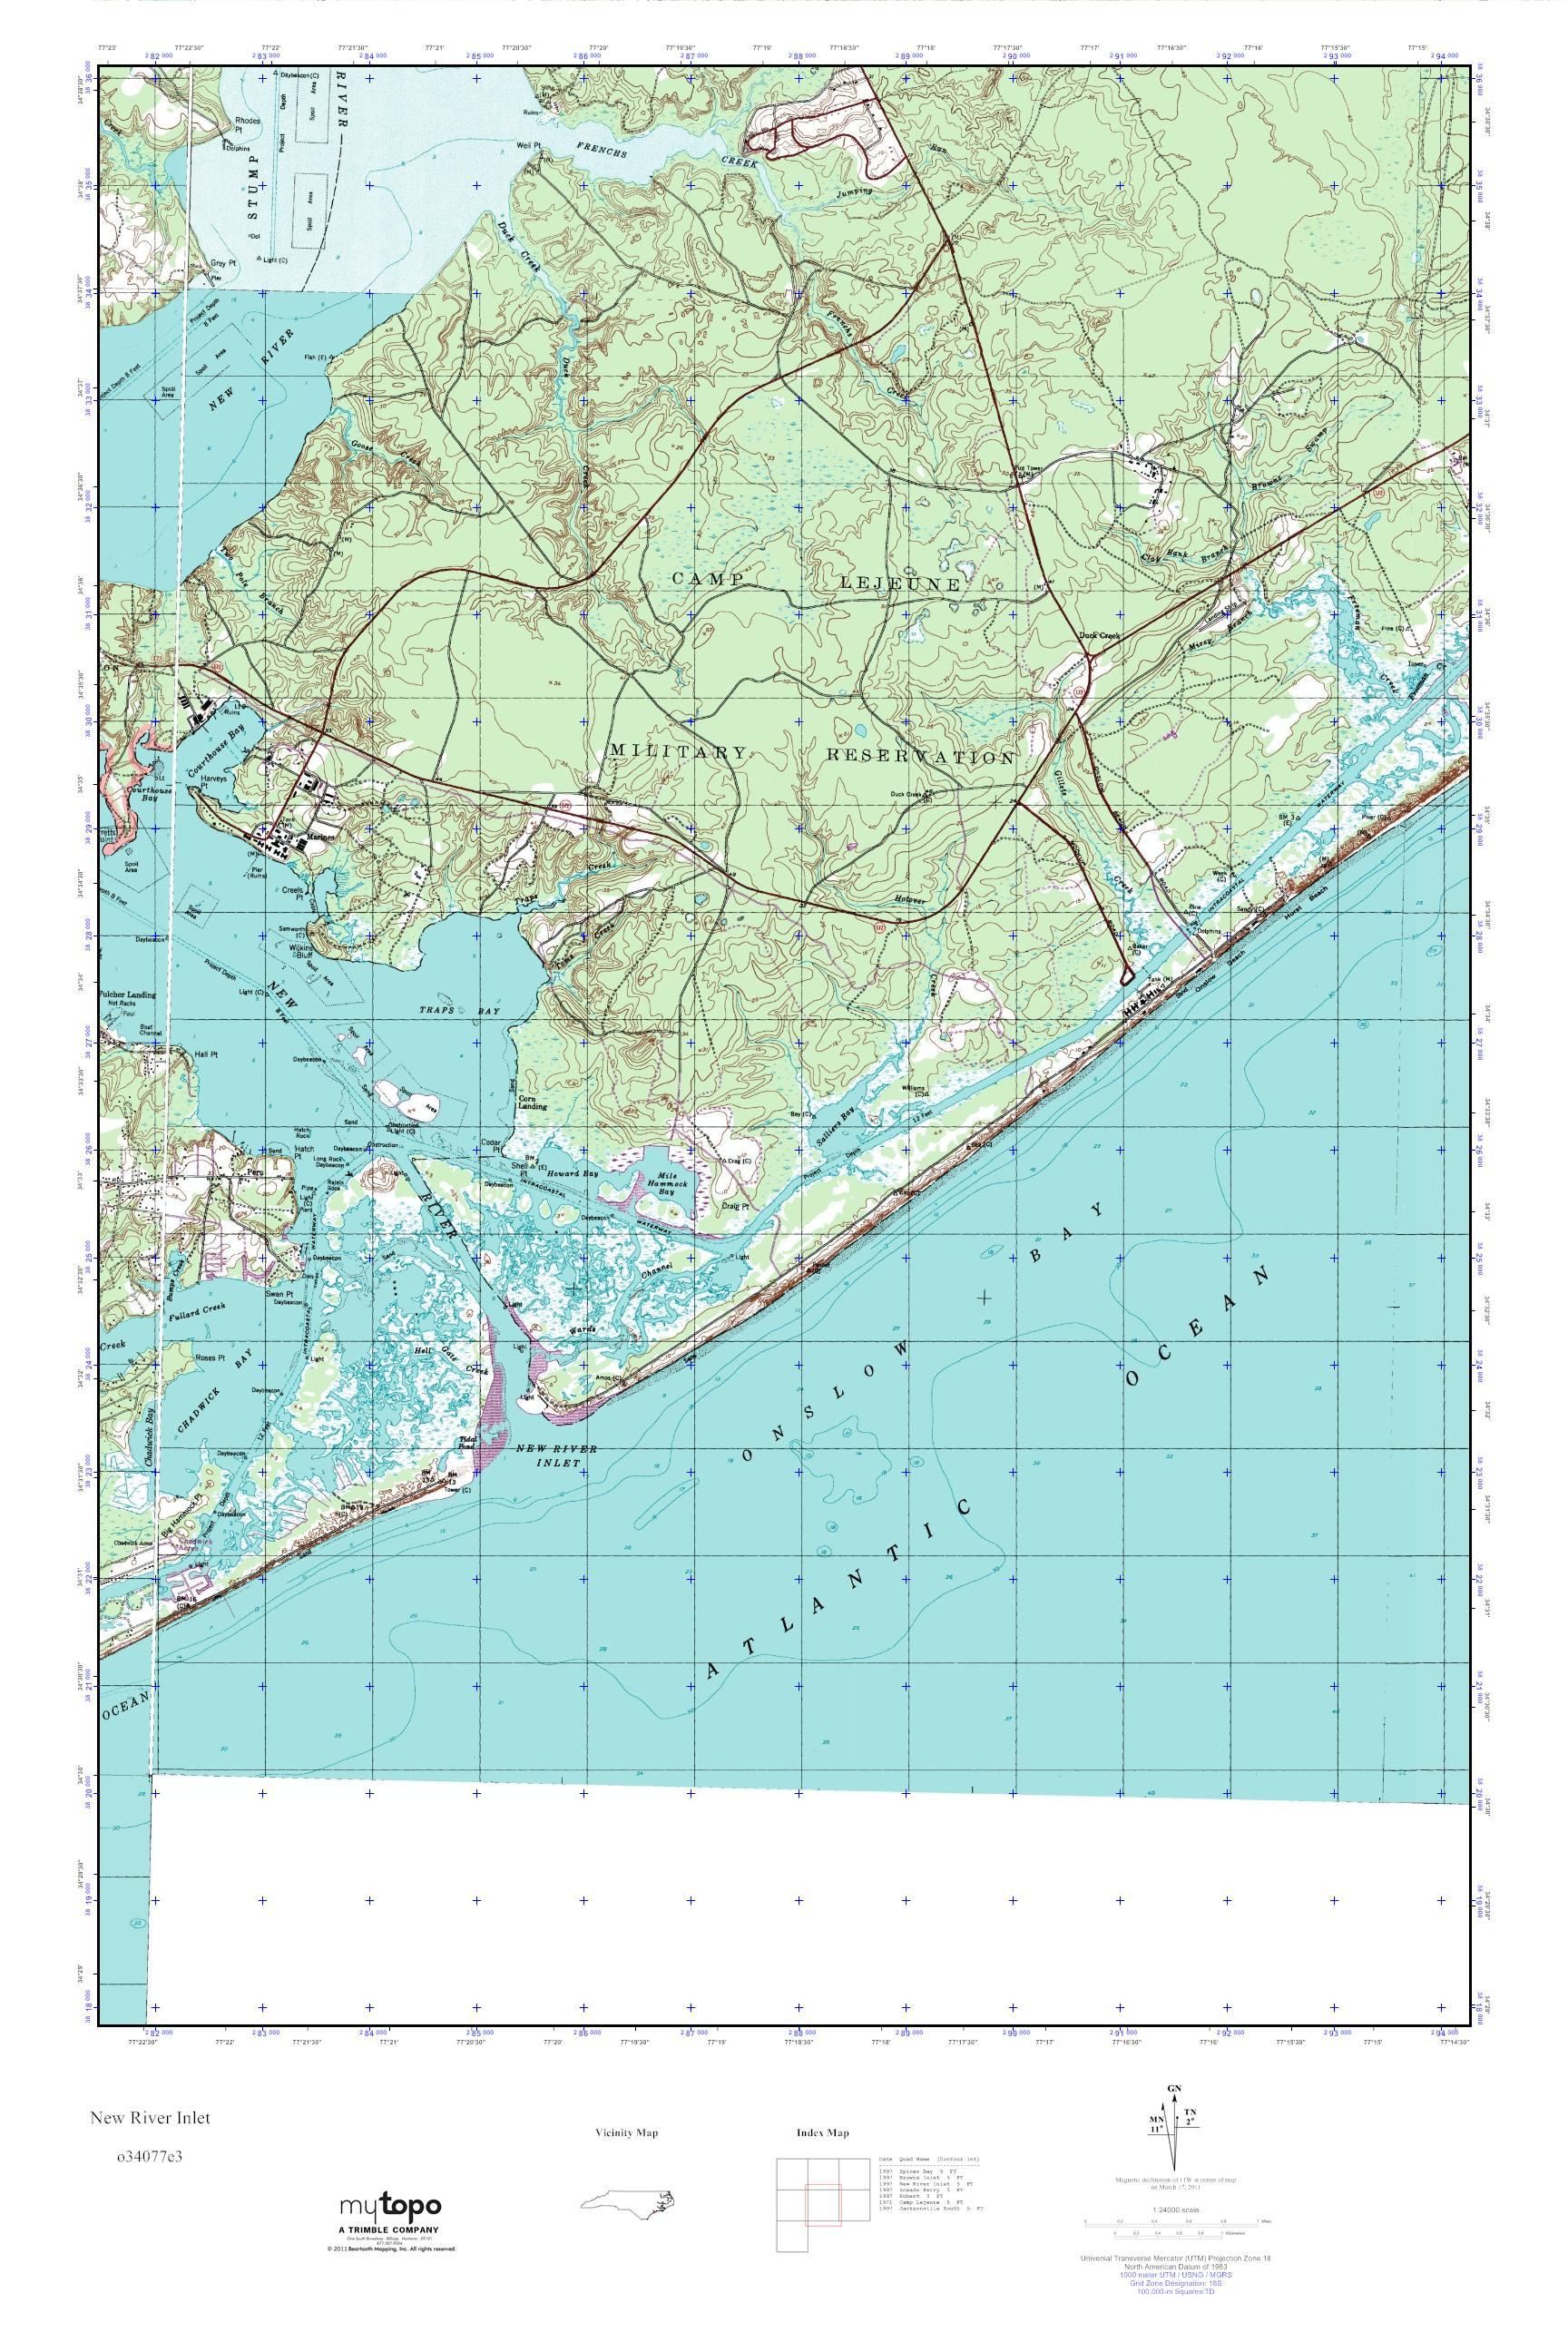 mytopo new river inlet north carolina usgs quad topo map -